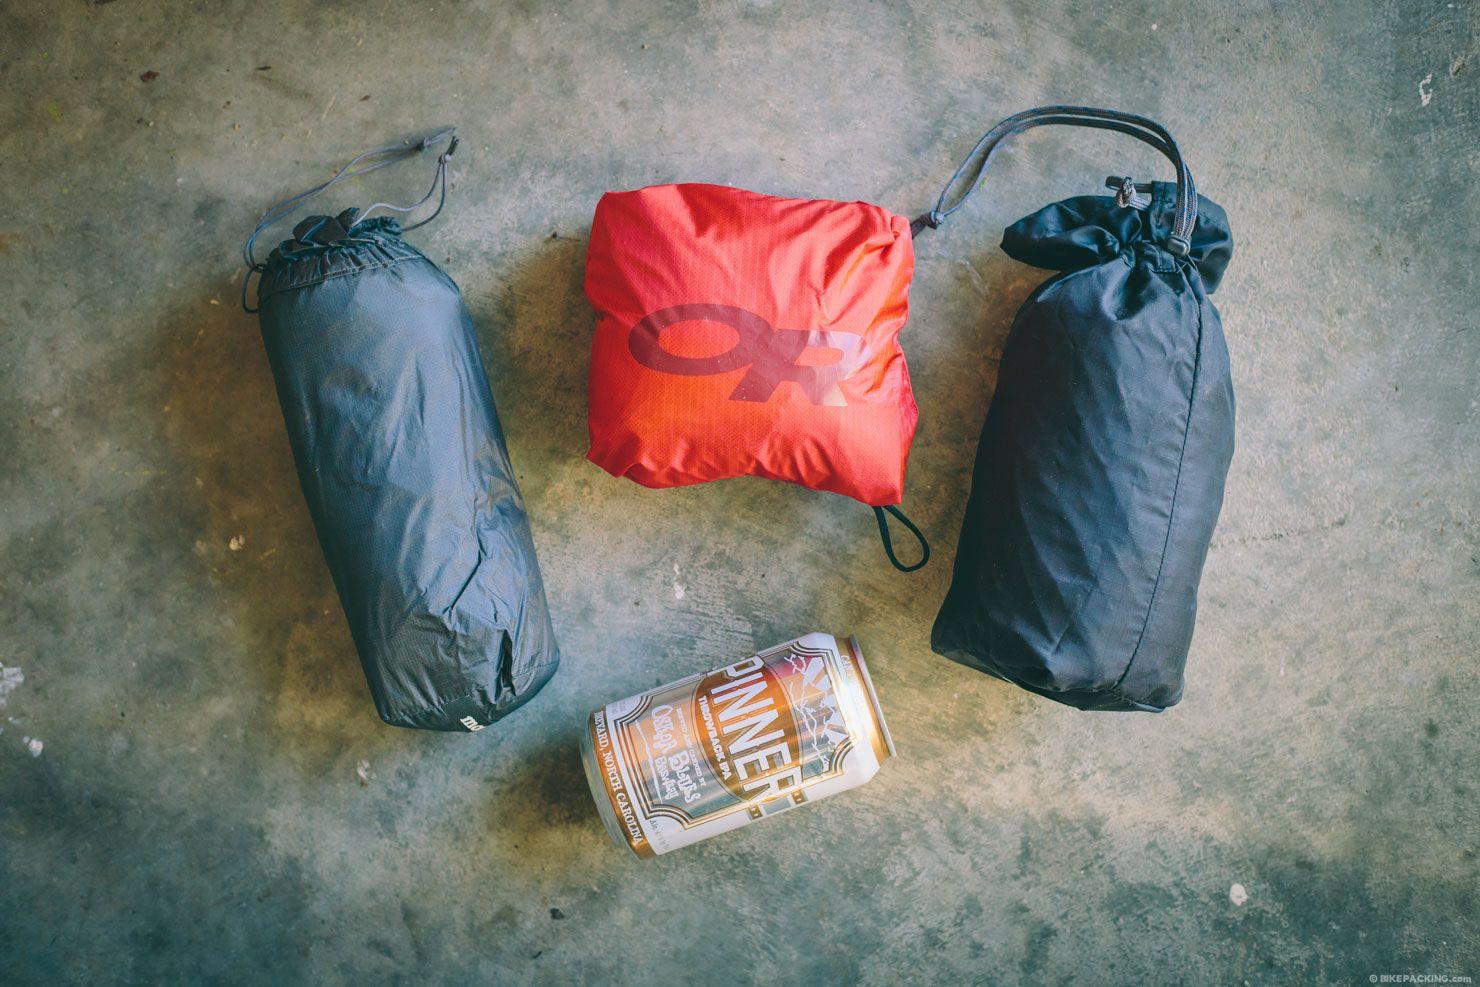 Ultralight Rain Jackets Bikepacking Com Packable Rain Jacket Rain Jacket Packable Jacket